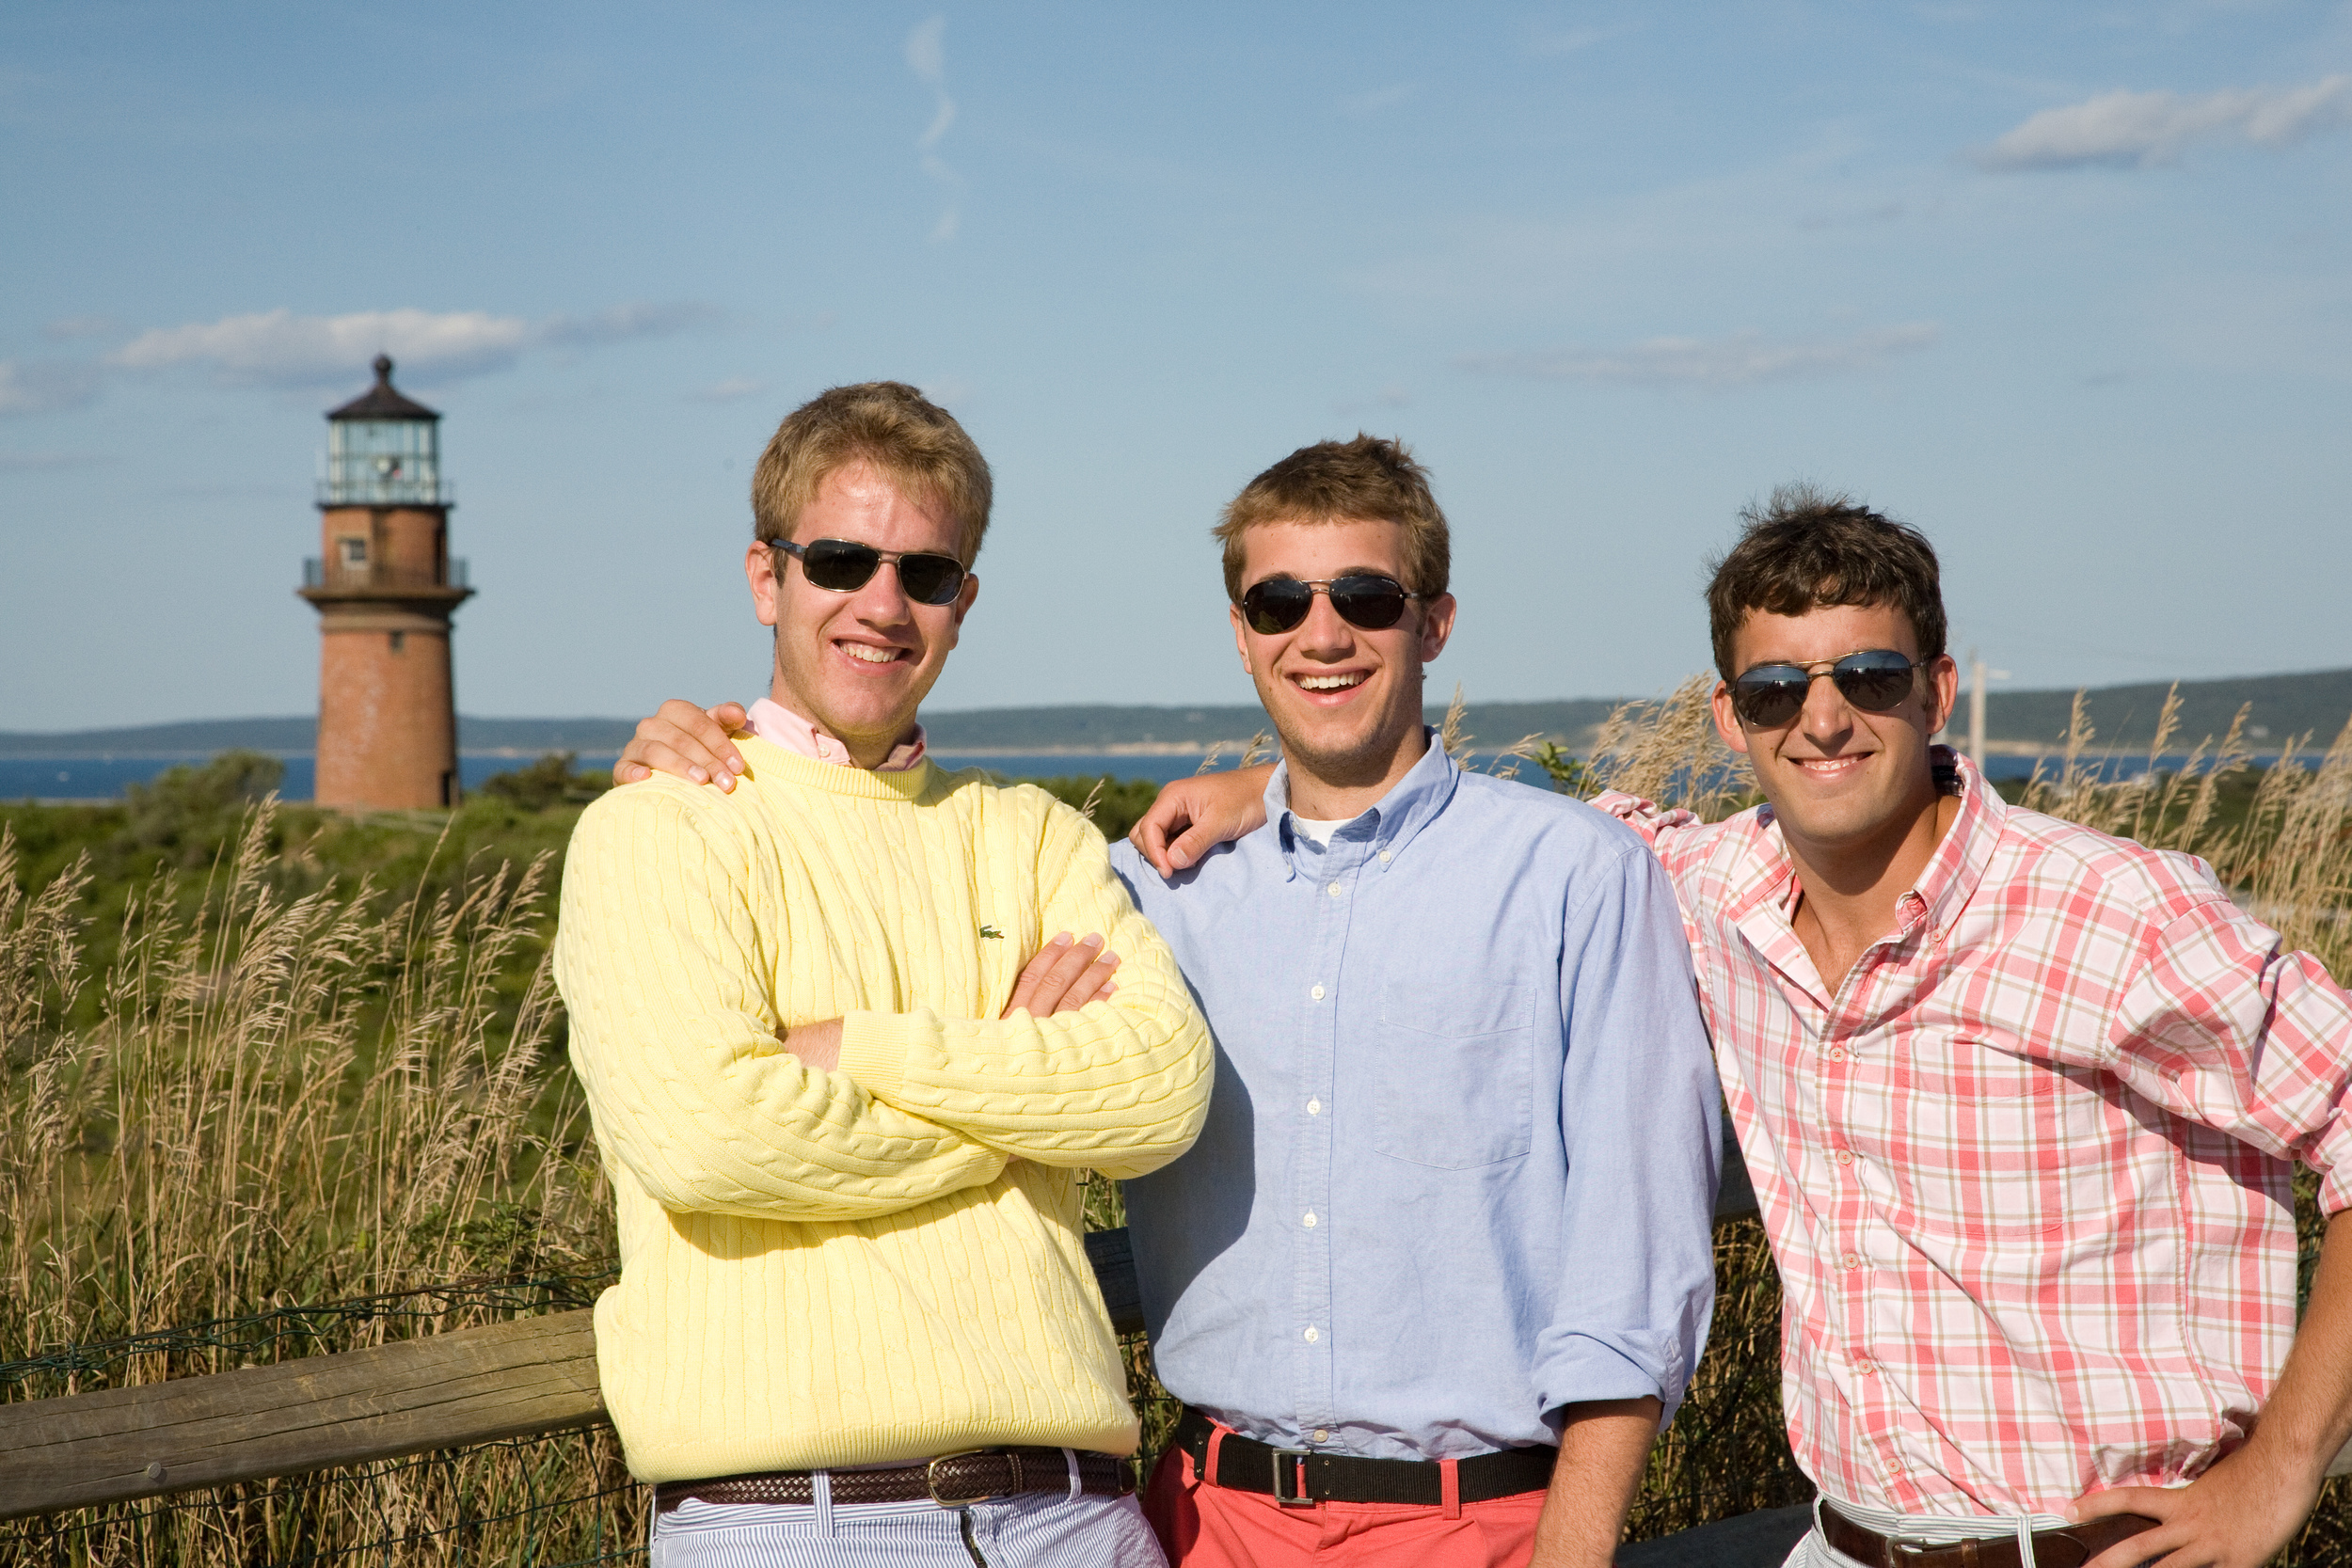 Three Boys at Aquinnah Lighthouse, Martha's Vineyard, MA